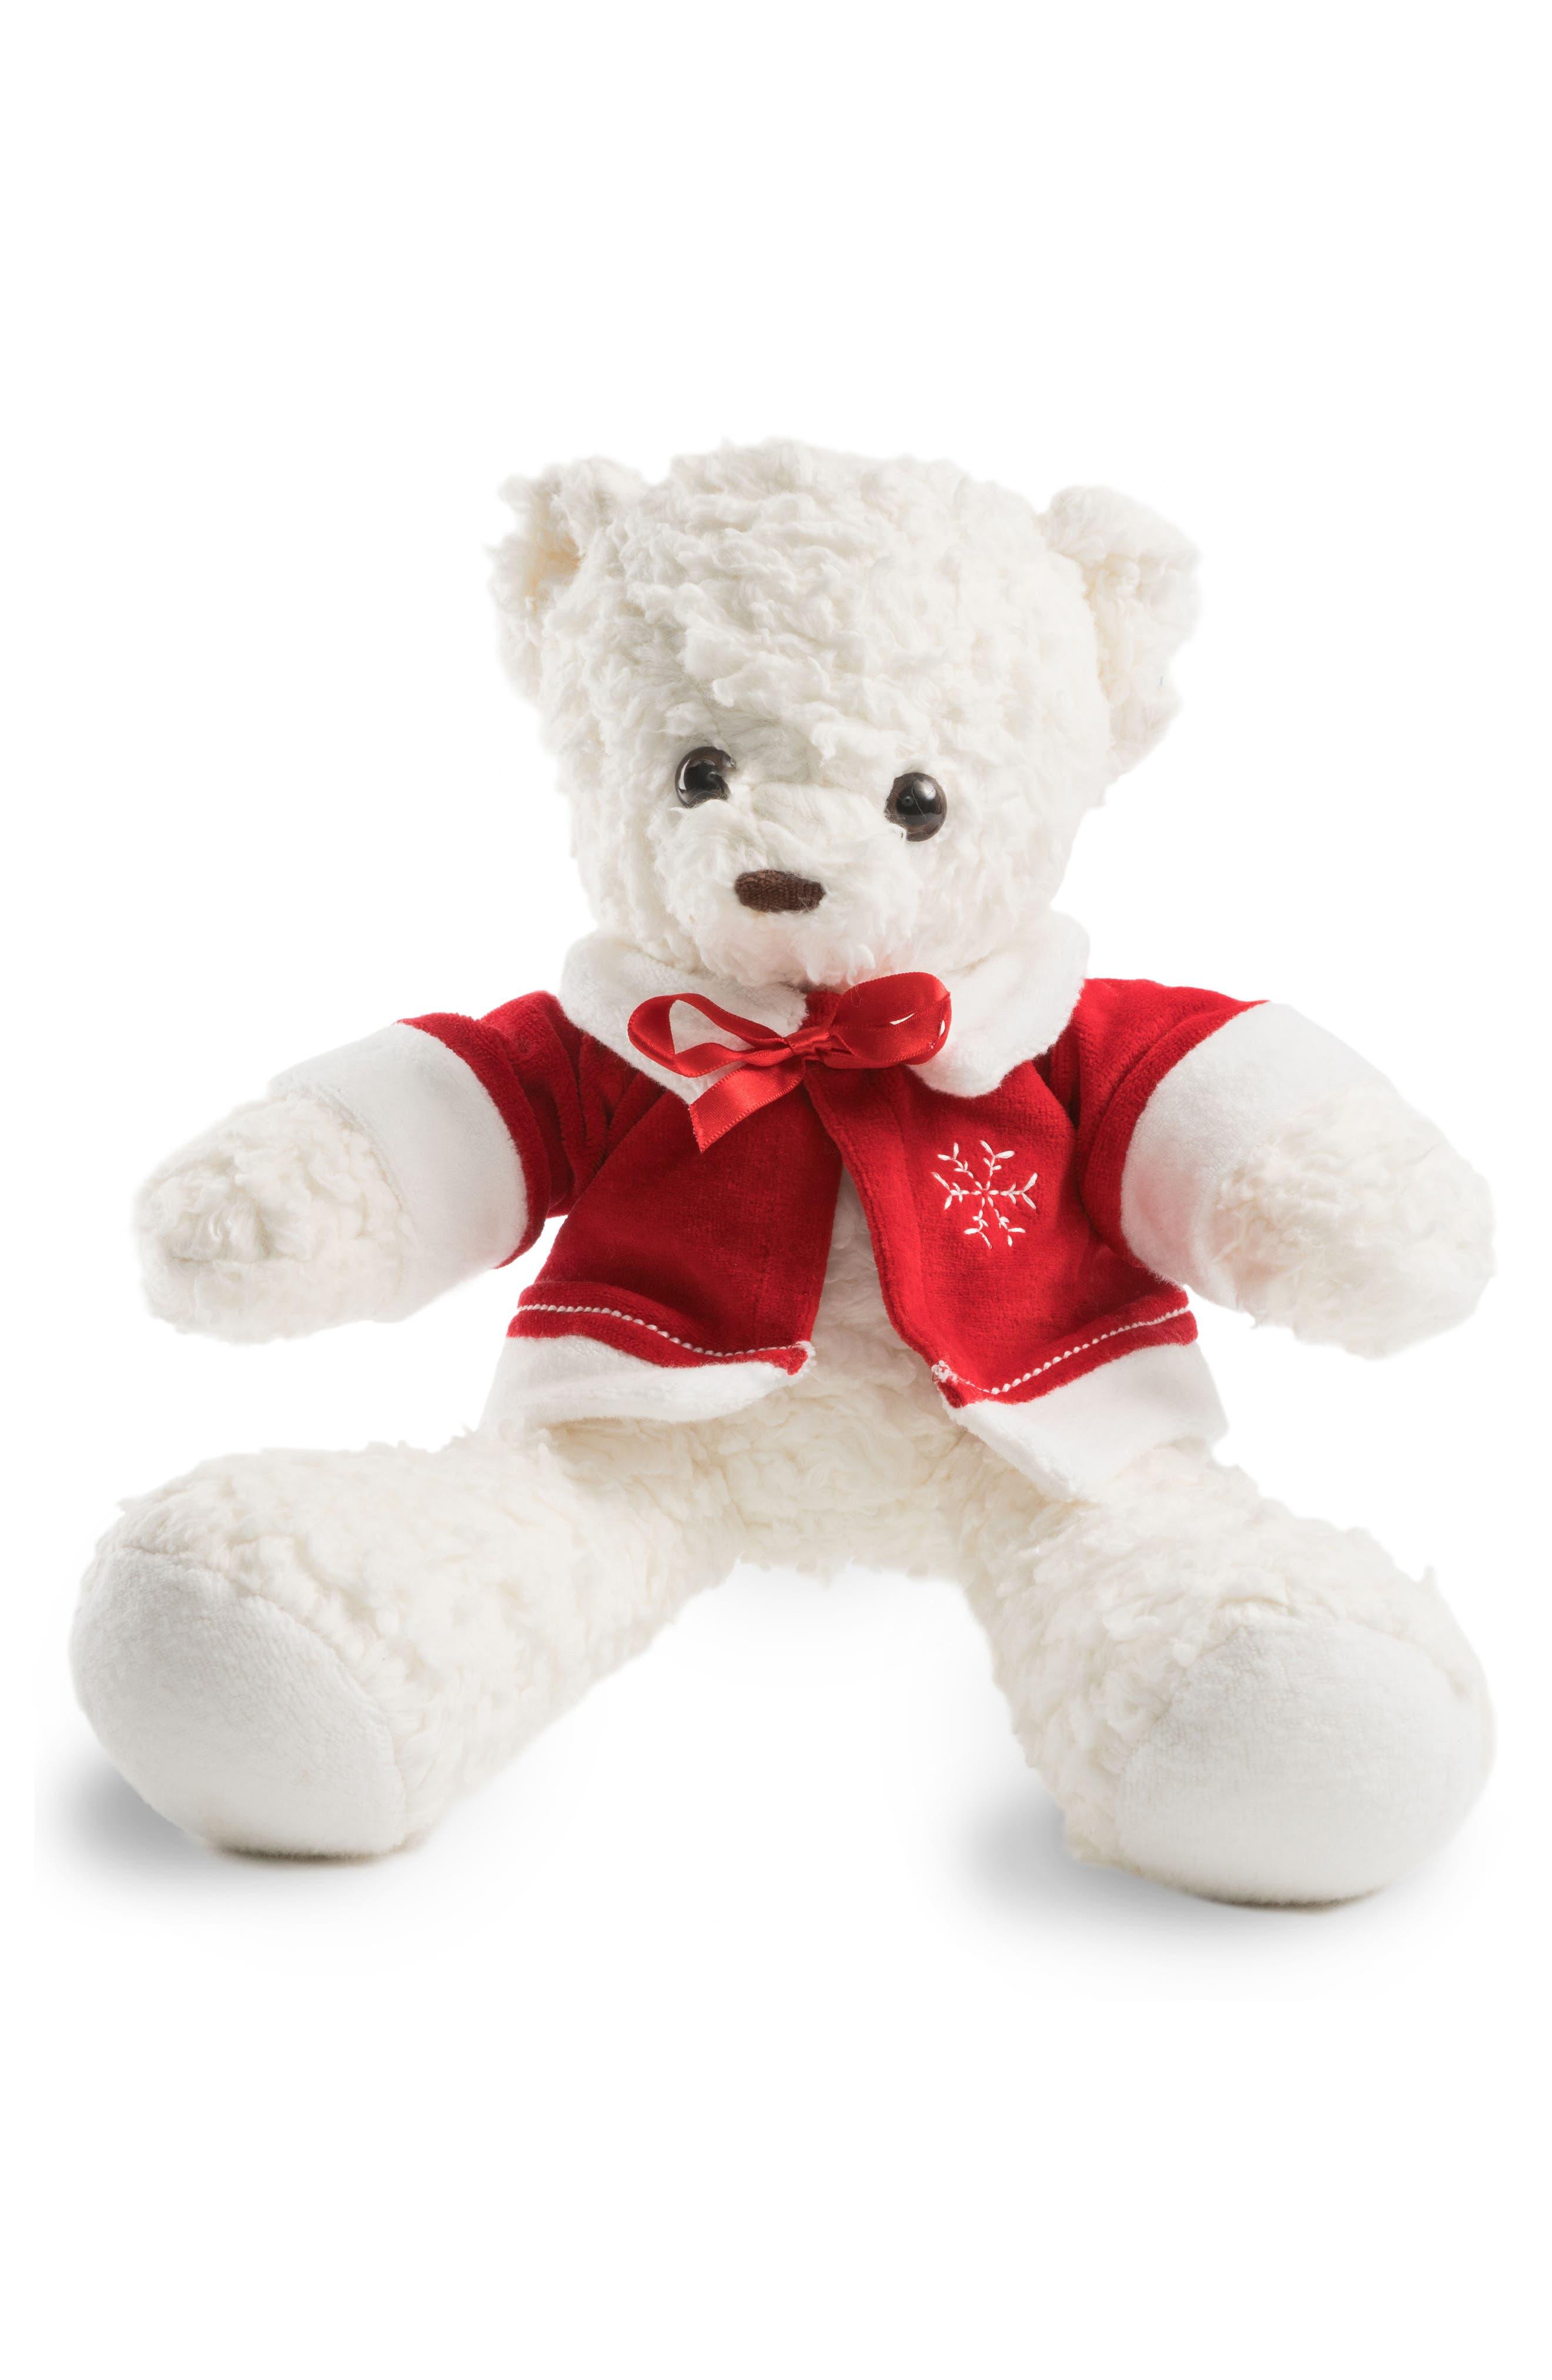 Medium Stuffed Bear with Holiday Jacket,                             Main thumbnail 1, color,